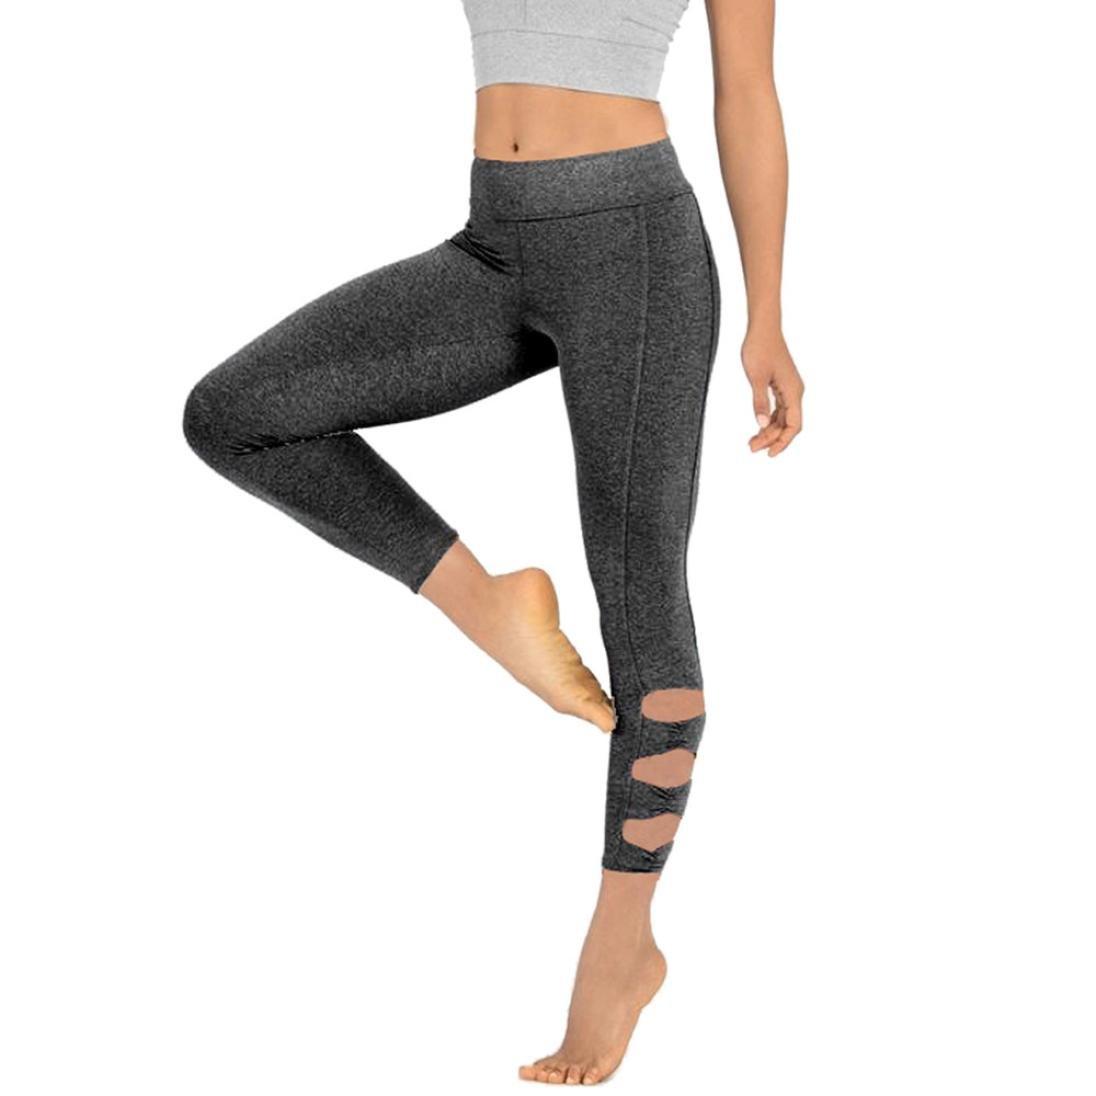 e6a20ac403cdc1 Amazon.com: Pocciol Mesh Yoga Leggings, Women Cutout Tie Mid Waist Fitness  Gym Trousers Sport Running Pants (S, New-Gray): Pet Supplies